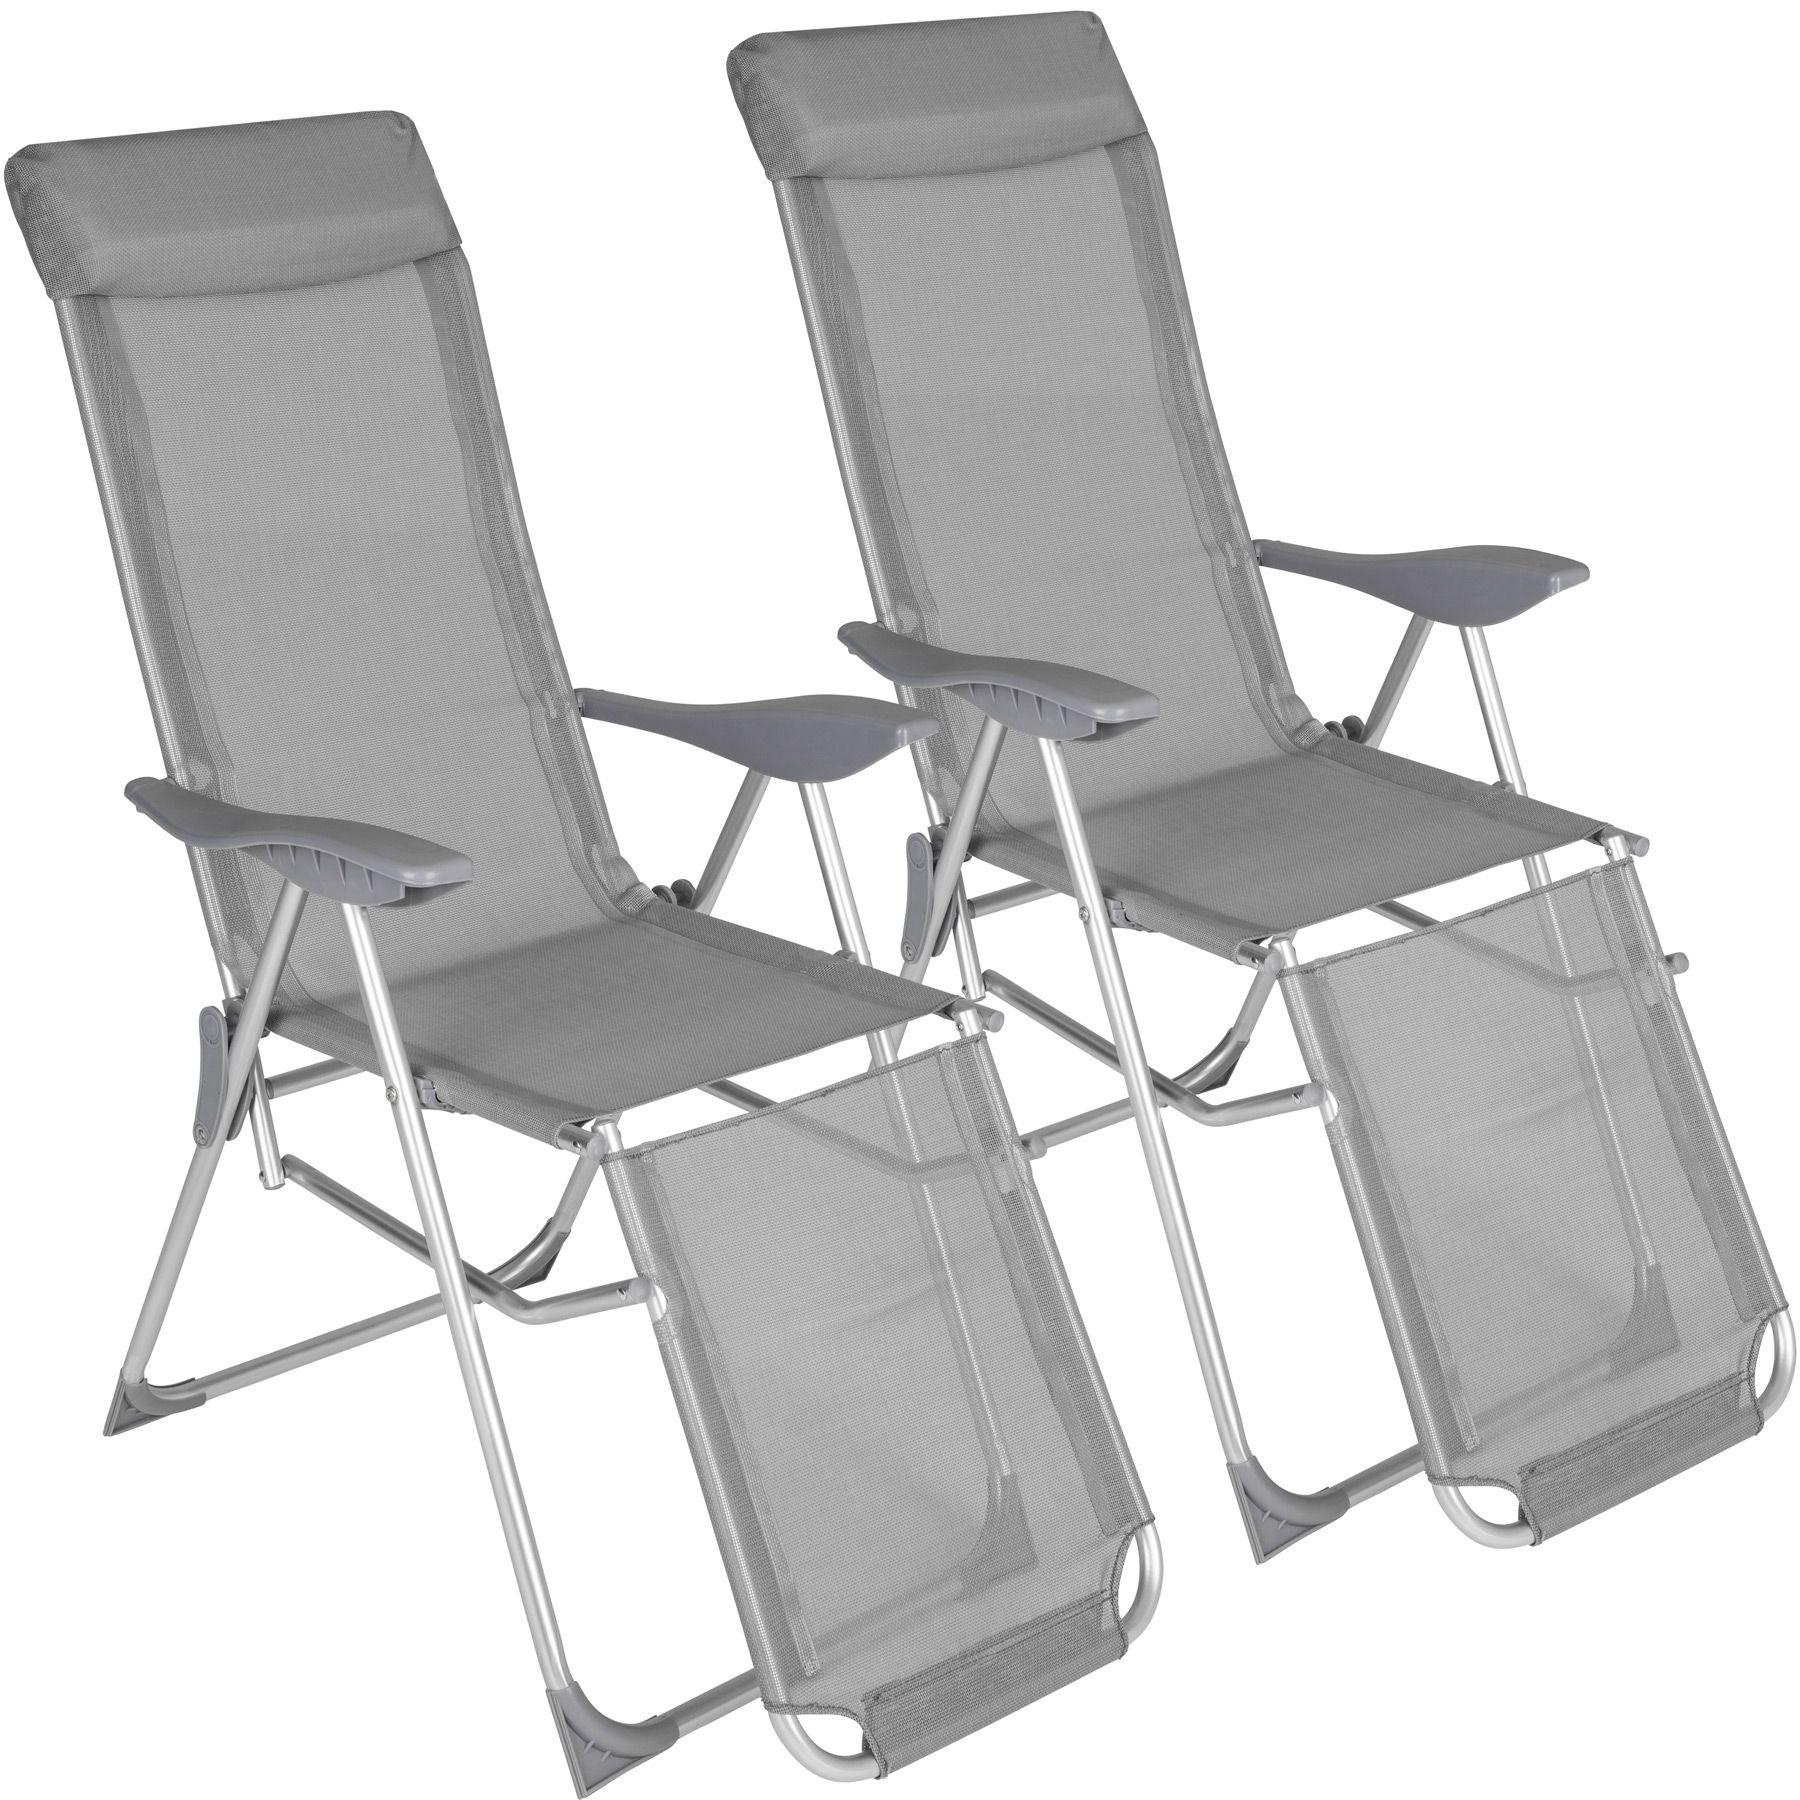 Magnificent Details About Set Of 2 Folding Chairs Aluminium Multi Position Chair Stool Garden Terrace Creativecarmelina Interior Chair Design Creativecarmelinacom